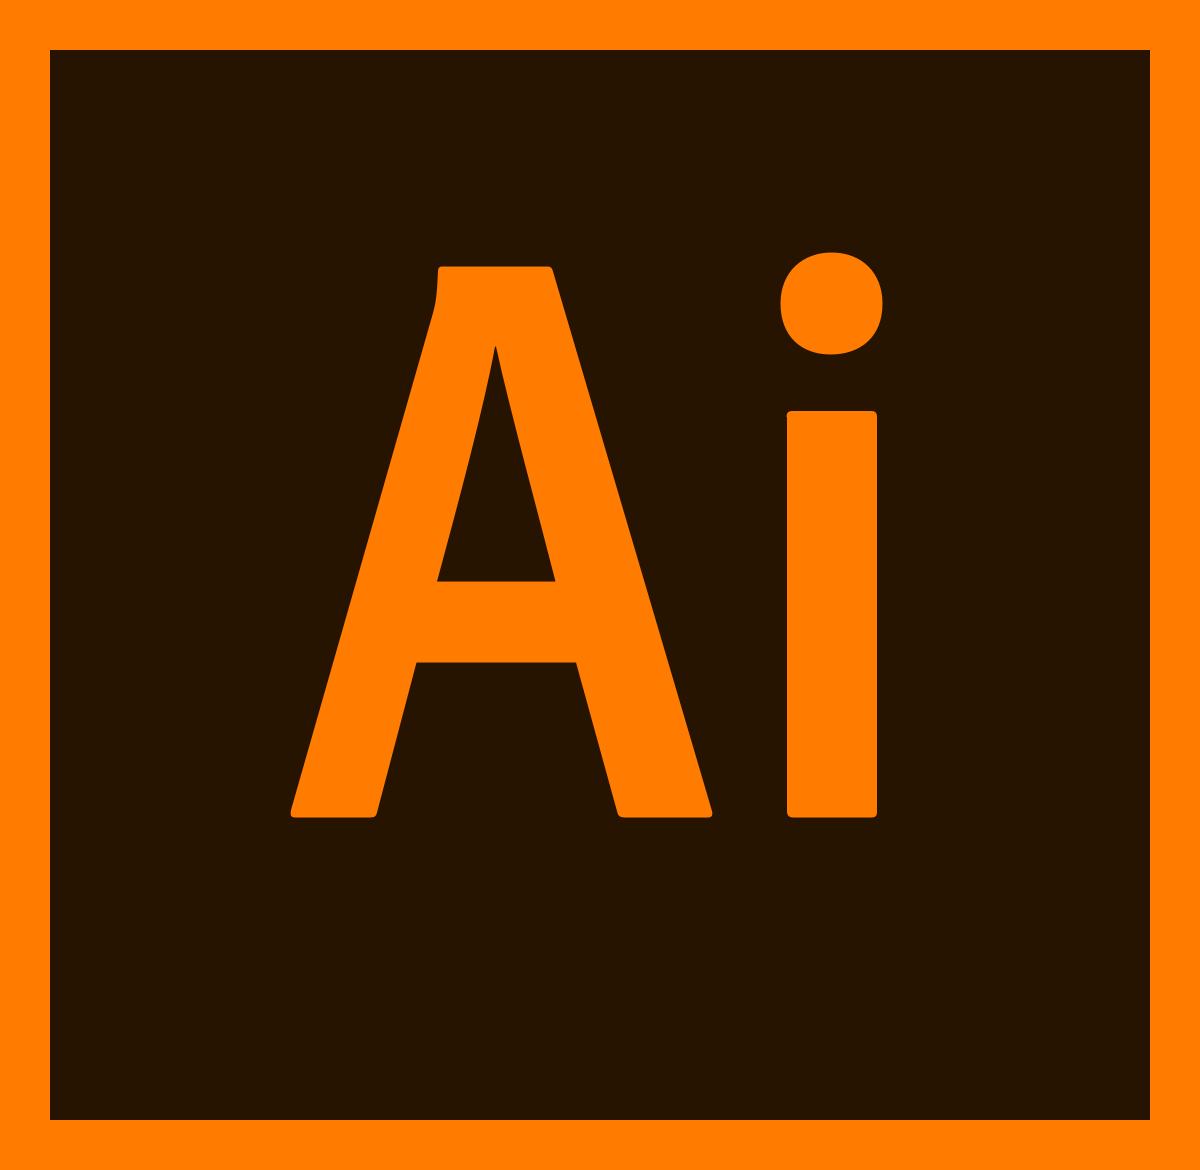 Adobe Illustrator CC Crack 2017 & License Key Full Free